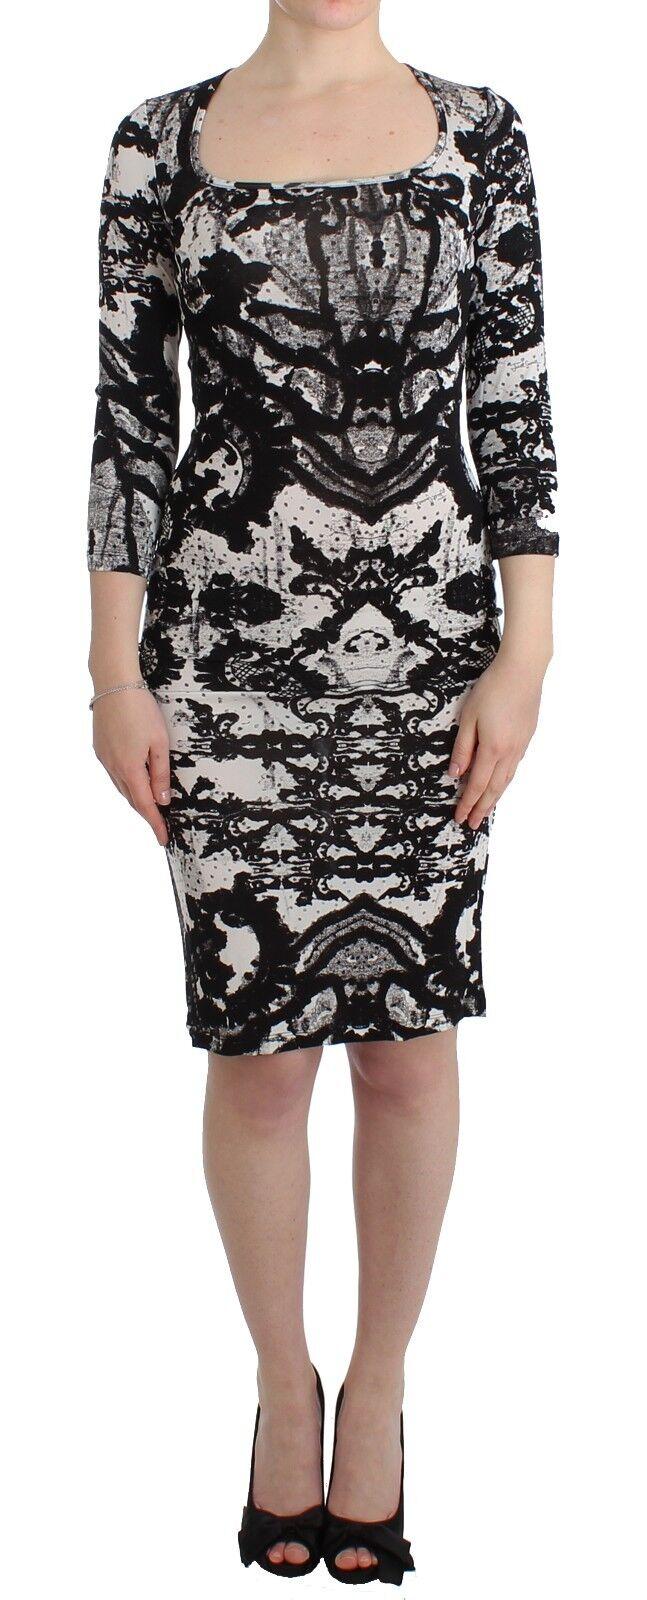 NEW  JUST CAVALLI Printed Sheath Dress Wiggle Pencil 3 4 Sleeve IT40 US6